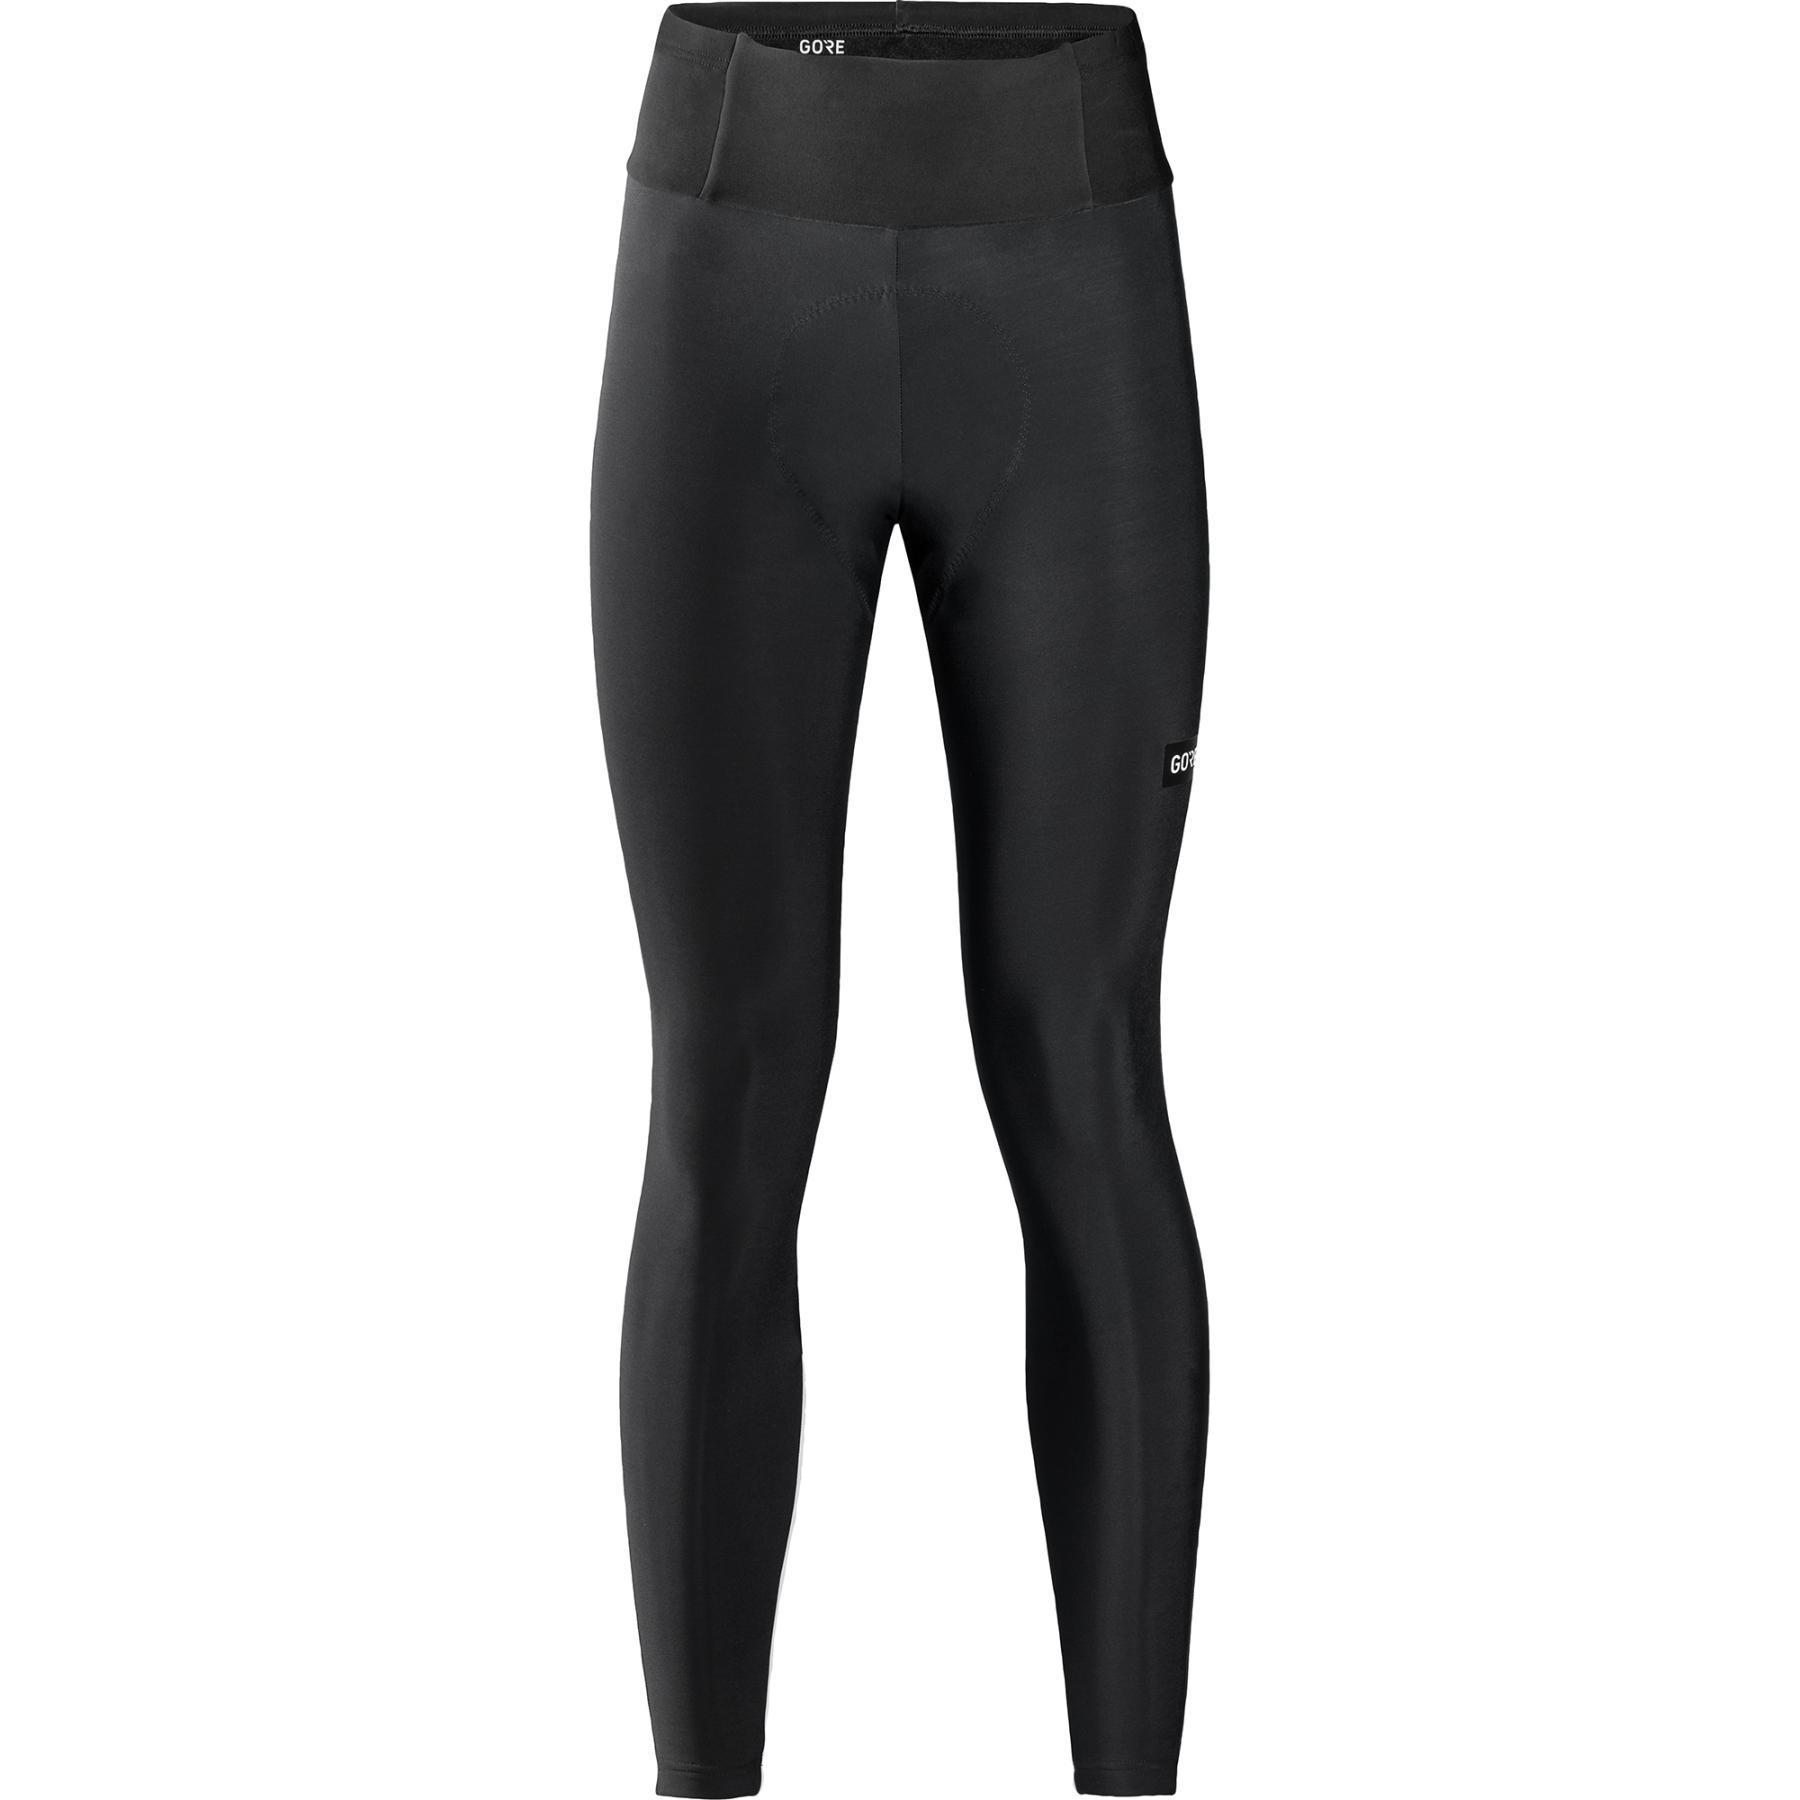 Foto de GORE Wear Progress Mallas térmicas para mujer - negro 9900